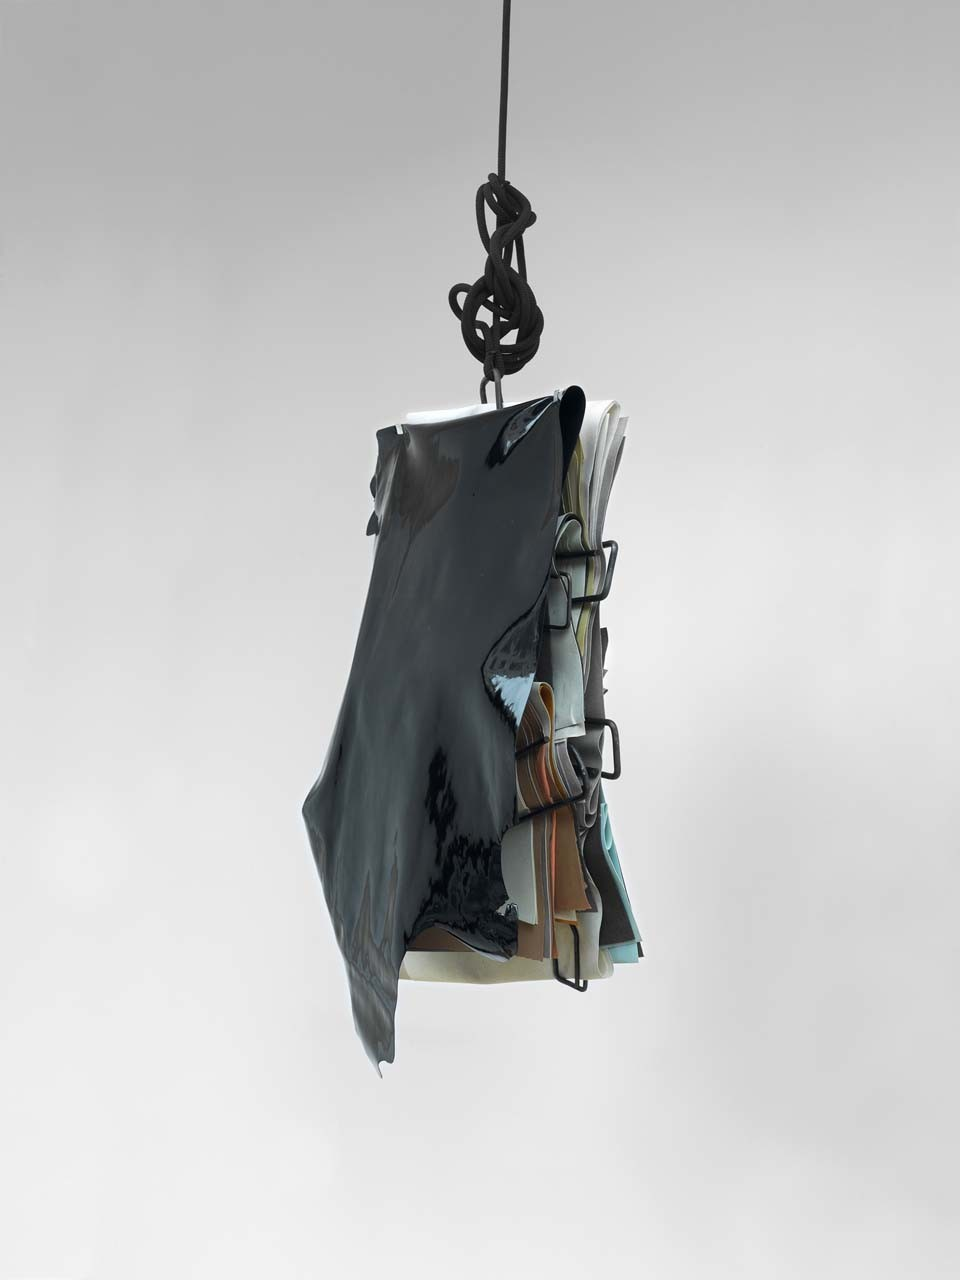 "<div class=""artwork_caption""><p>Kostas Sahpazis, Merged Down, 2013</p></div>"